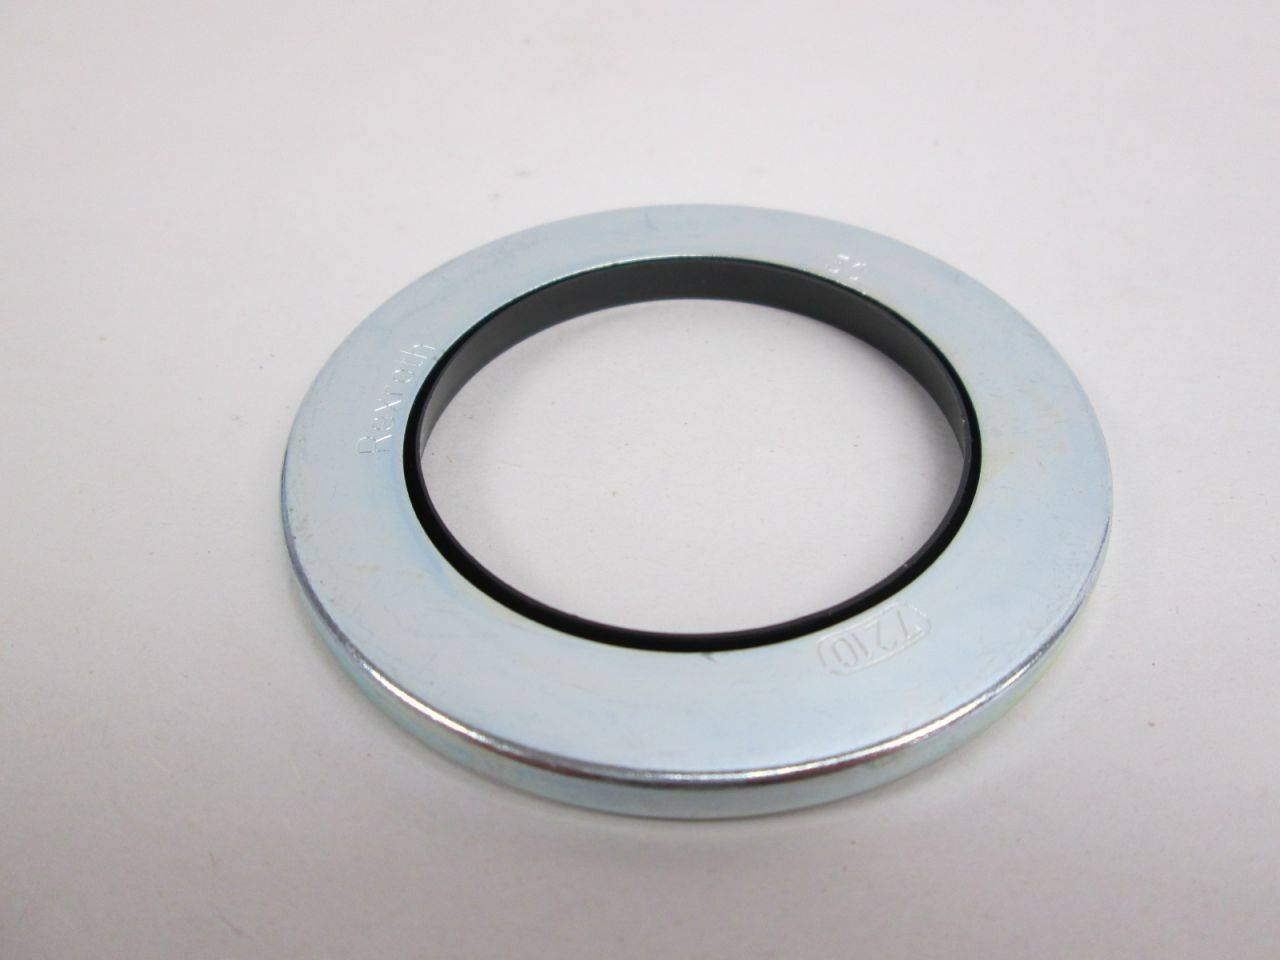 Sterling Seal ORVT390x50 Viton Number-390 Standard O-Ring Pack of 50 21-3//8 OD 21 ID 21-3//8 OD Sur-Seal 70 Durometer Hardness Fluoropolymer Elastomer 21 ID Pack of 50